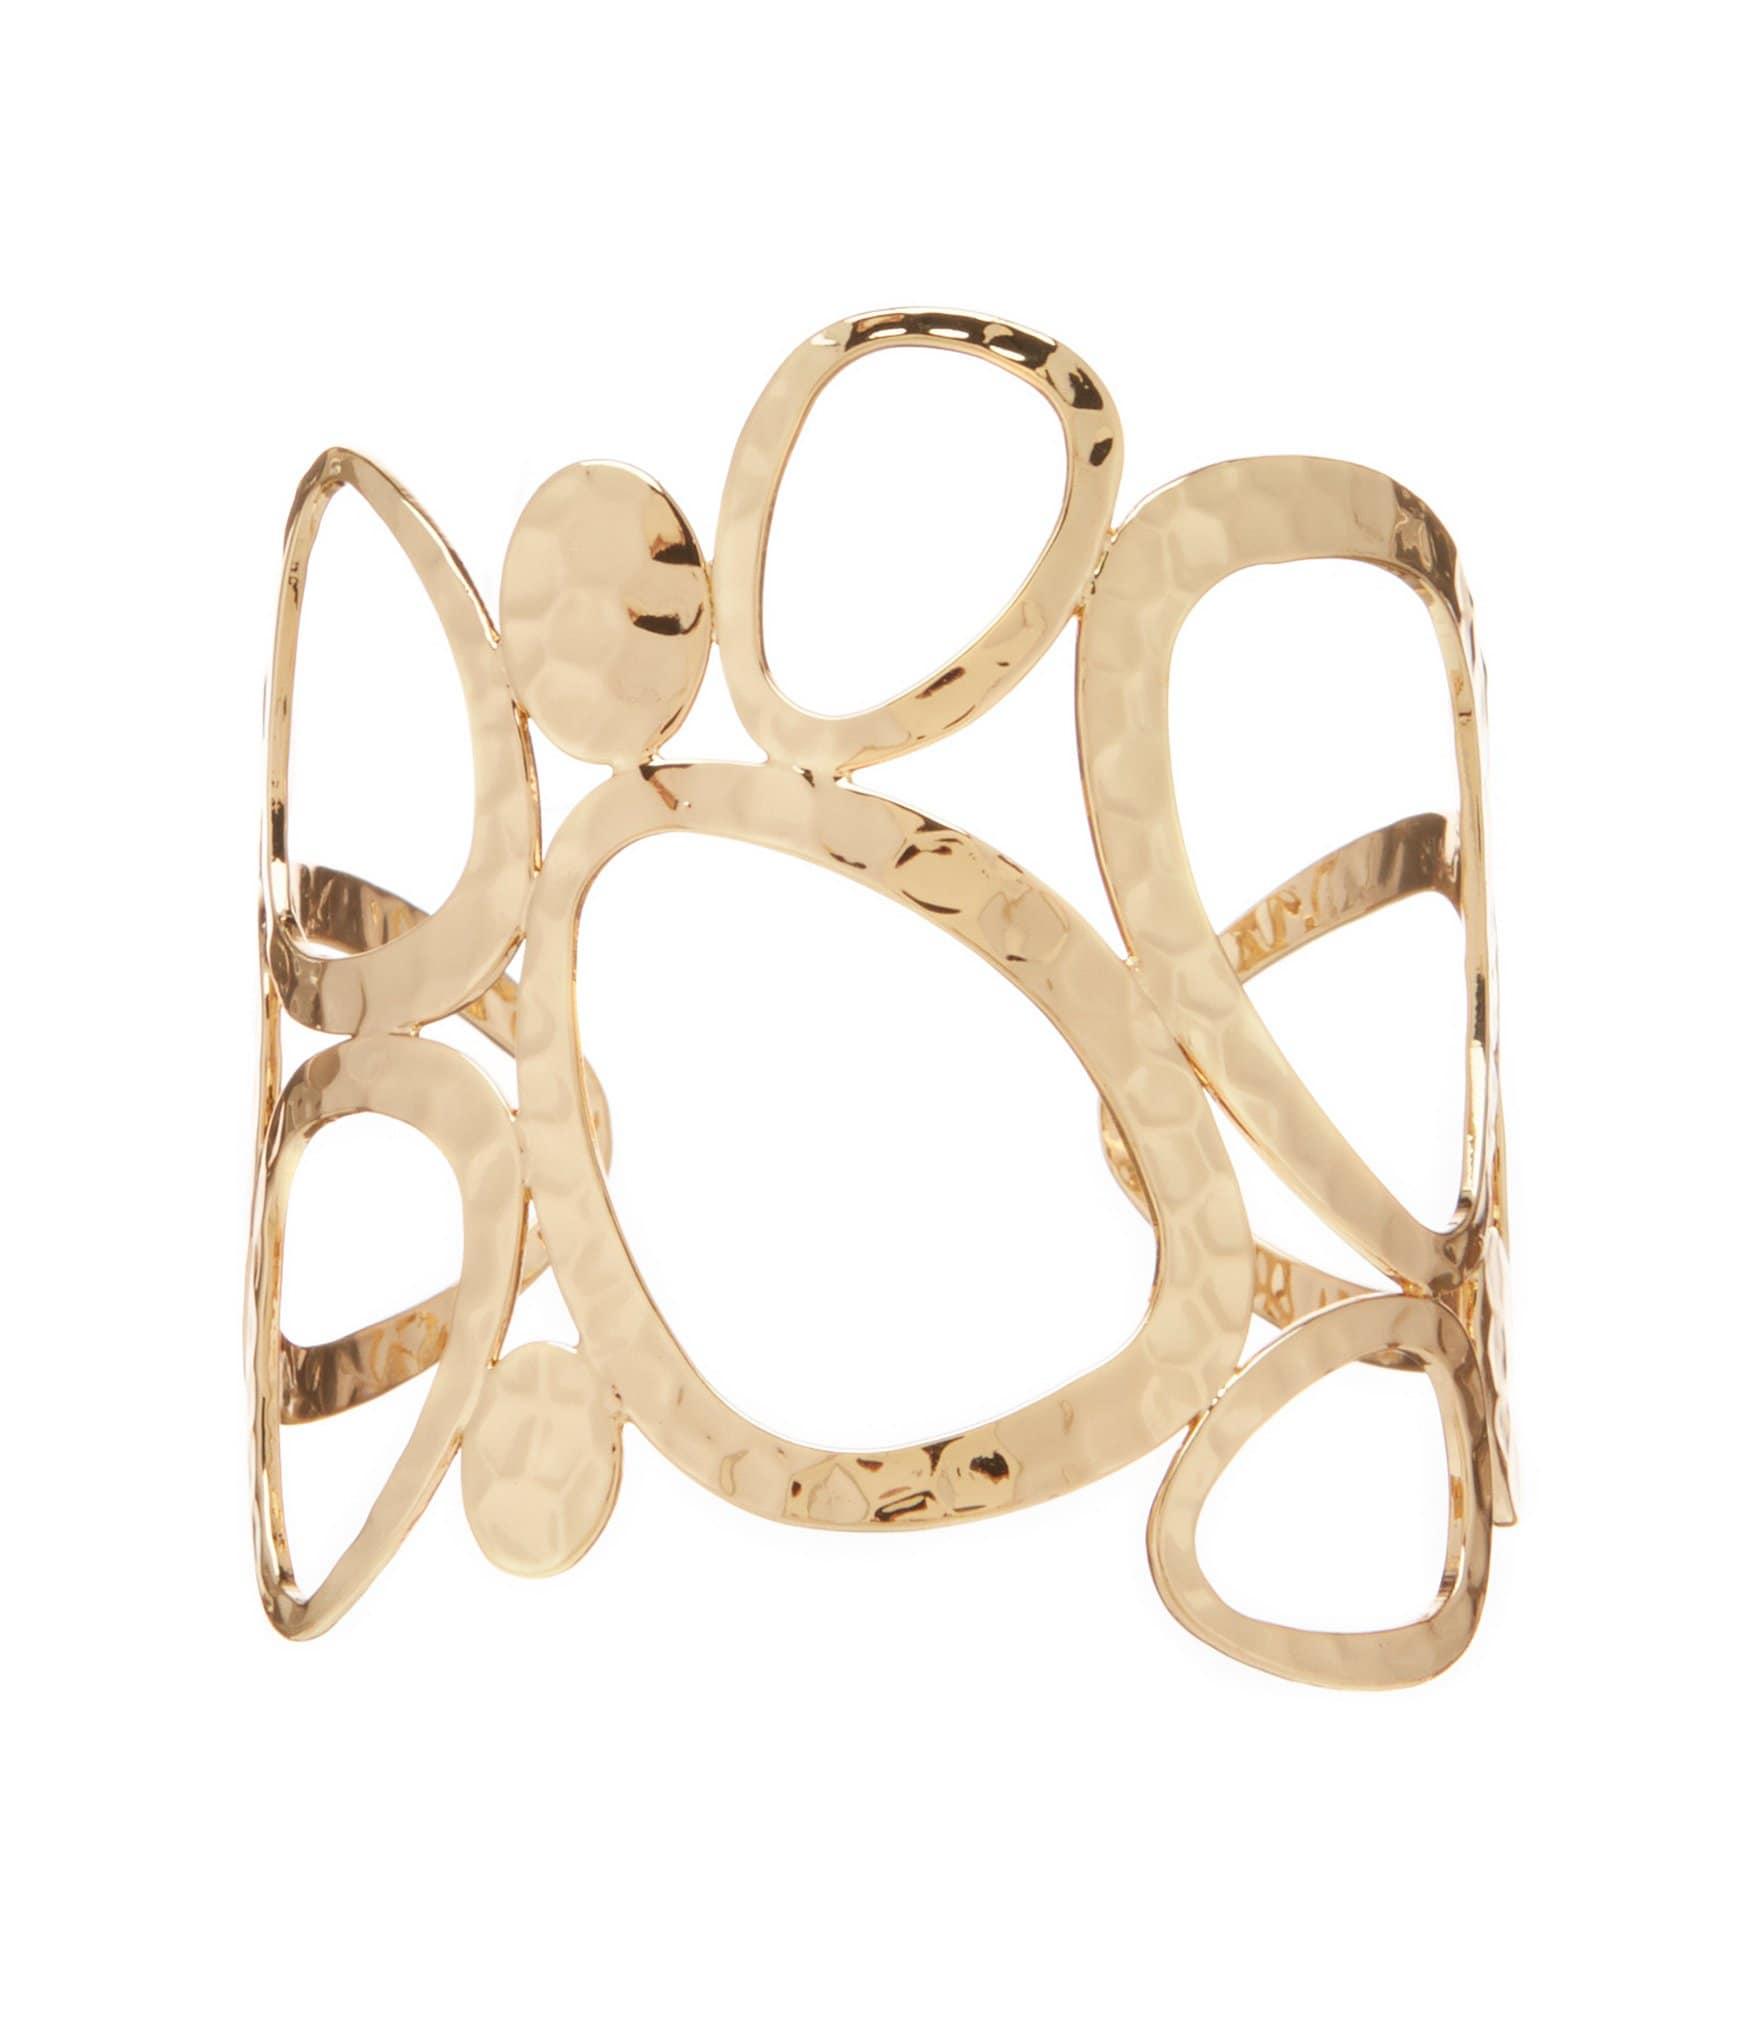 Pandora bracelet dillards - Pandora Bracelet Dillards 10